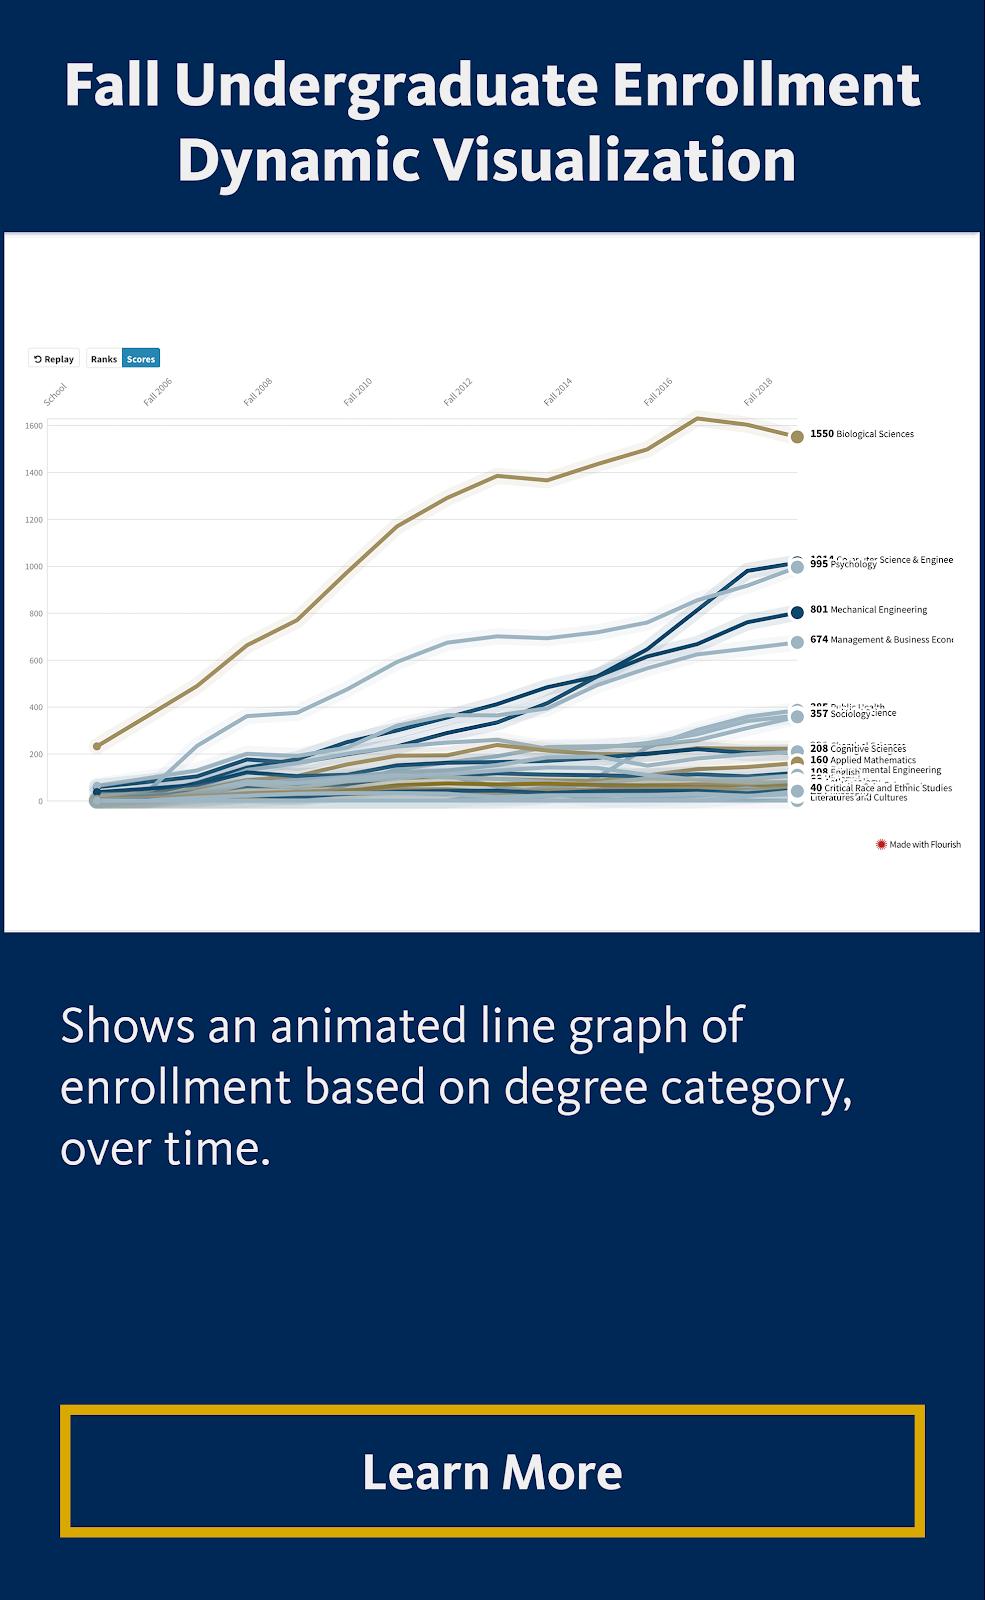 Fall Undergraduate Enrollment Dynamic Visualization